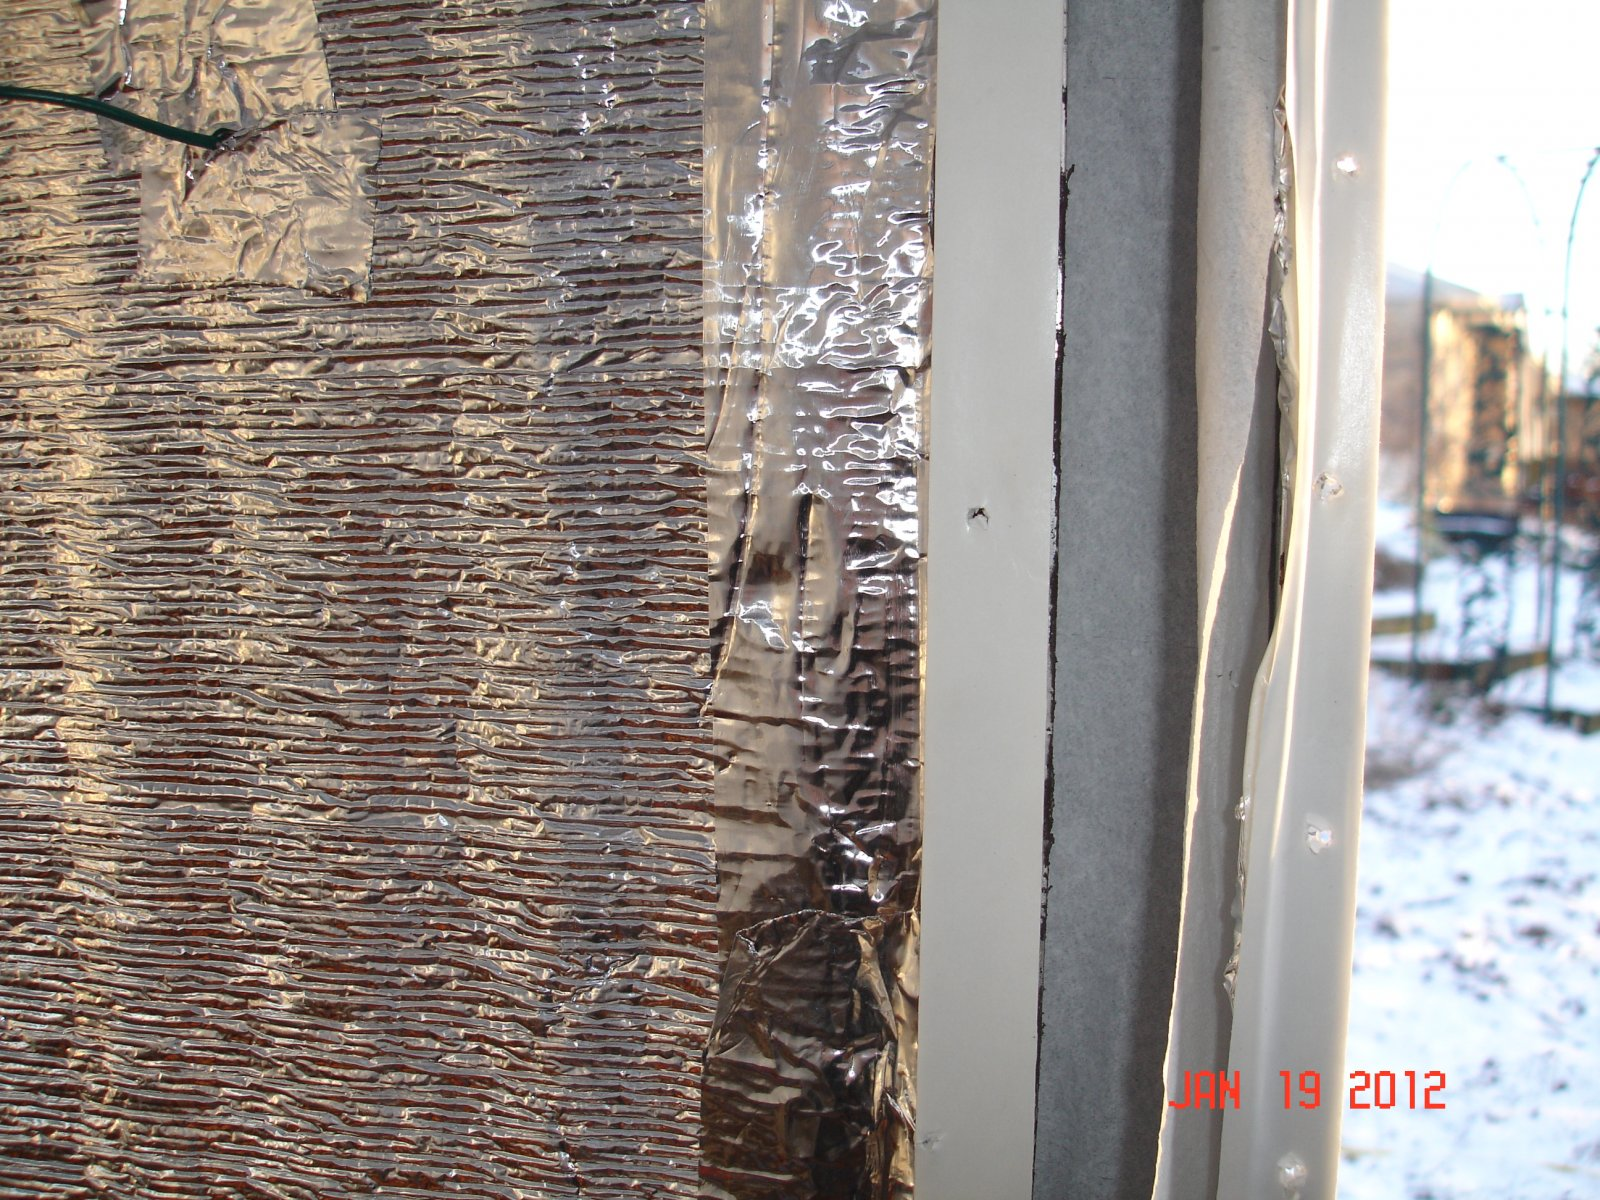 Click image for larger version  Name:toilet paper leak detector.jpg Views:134 Size:469.7 KB ID:149205